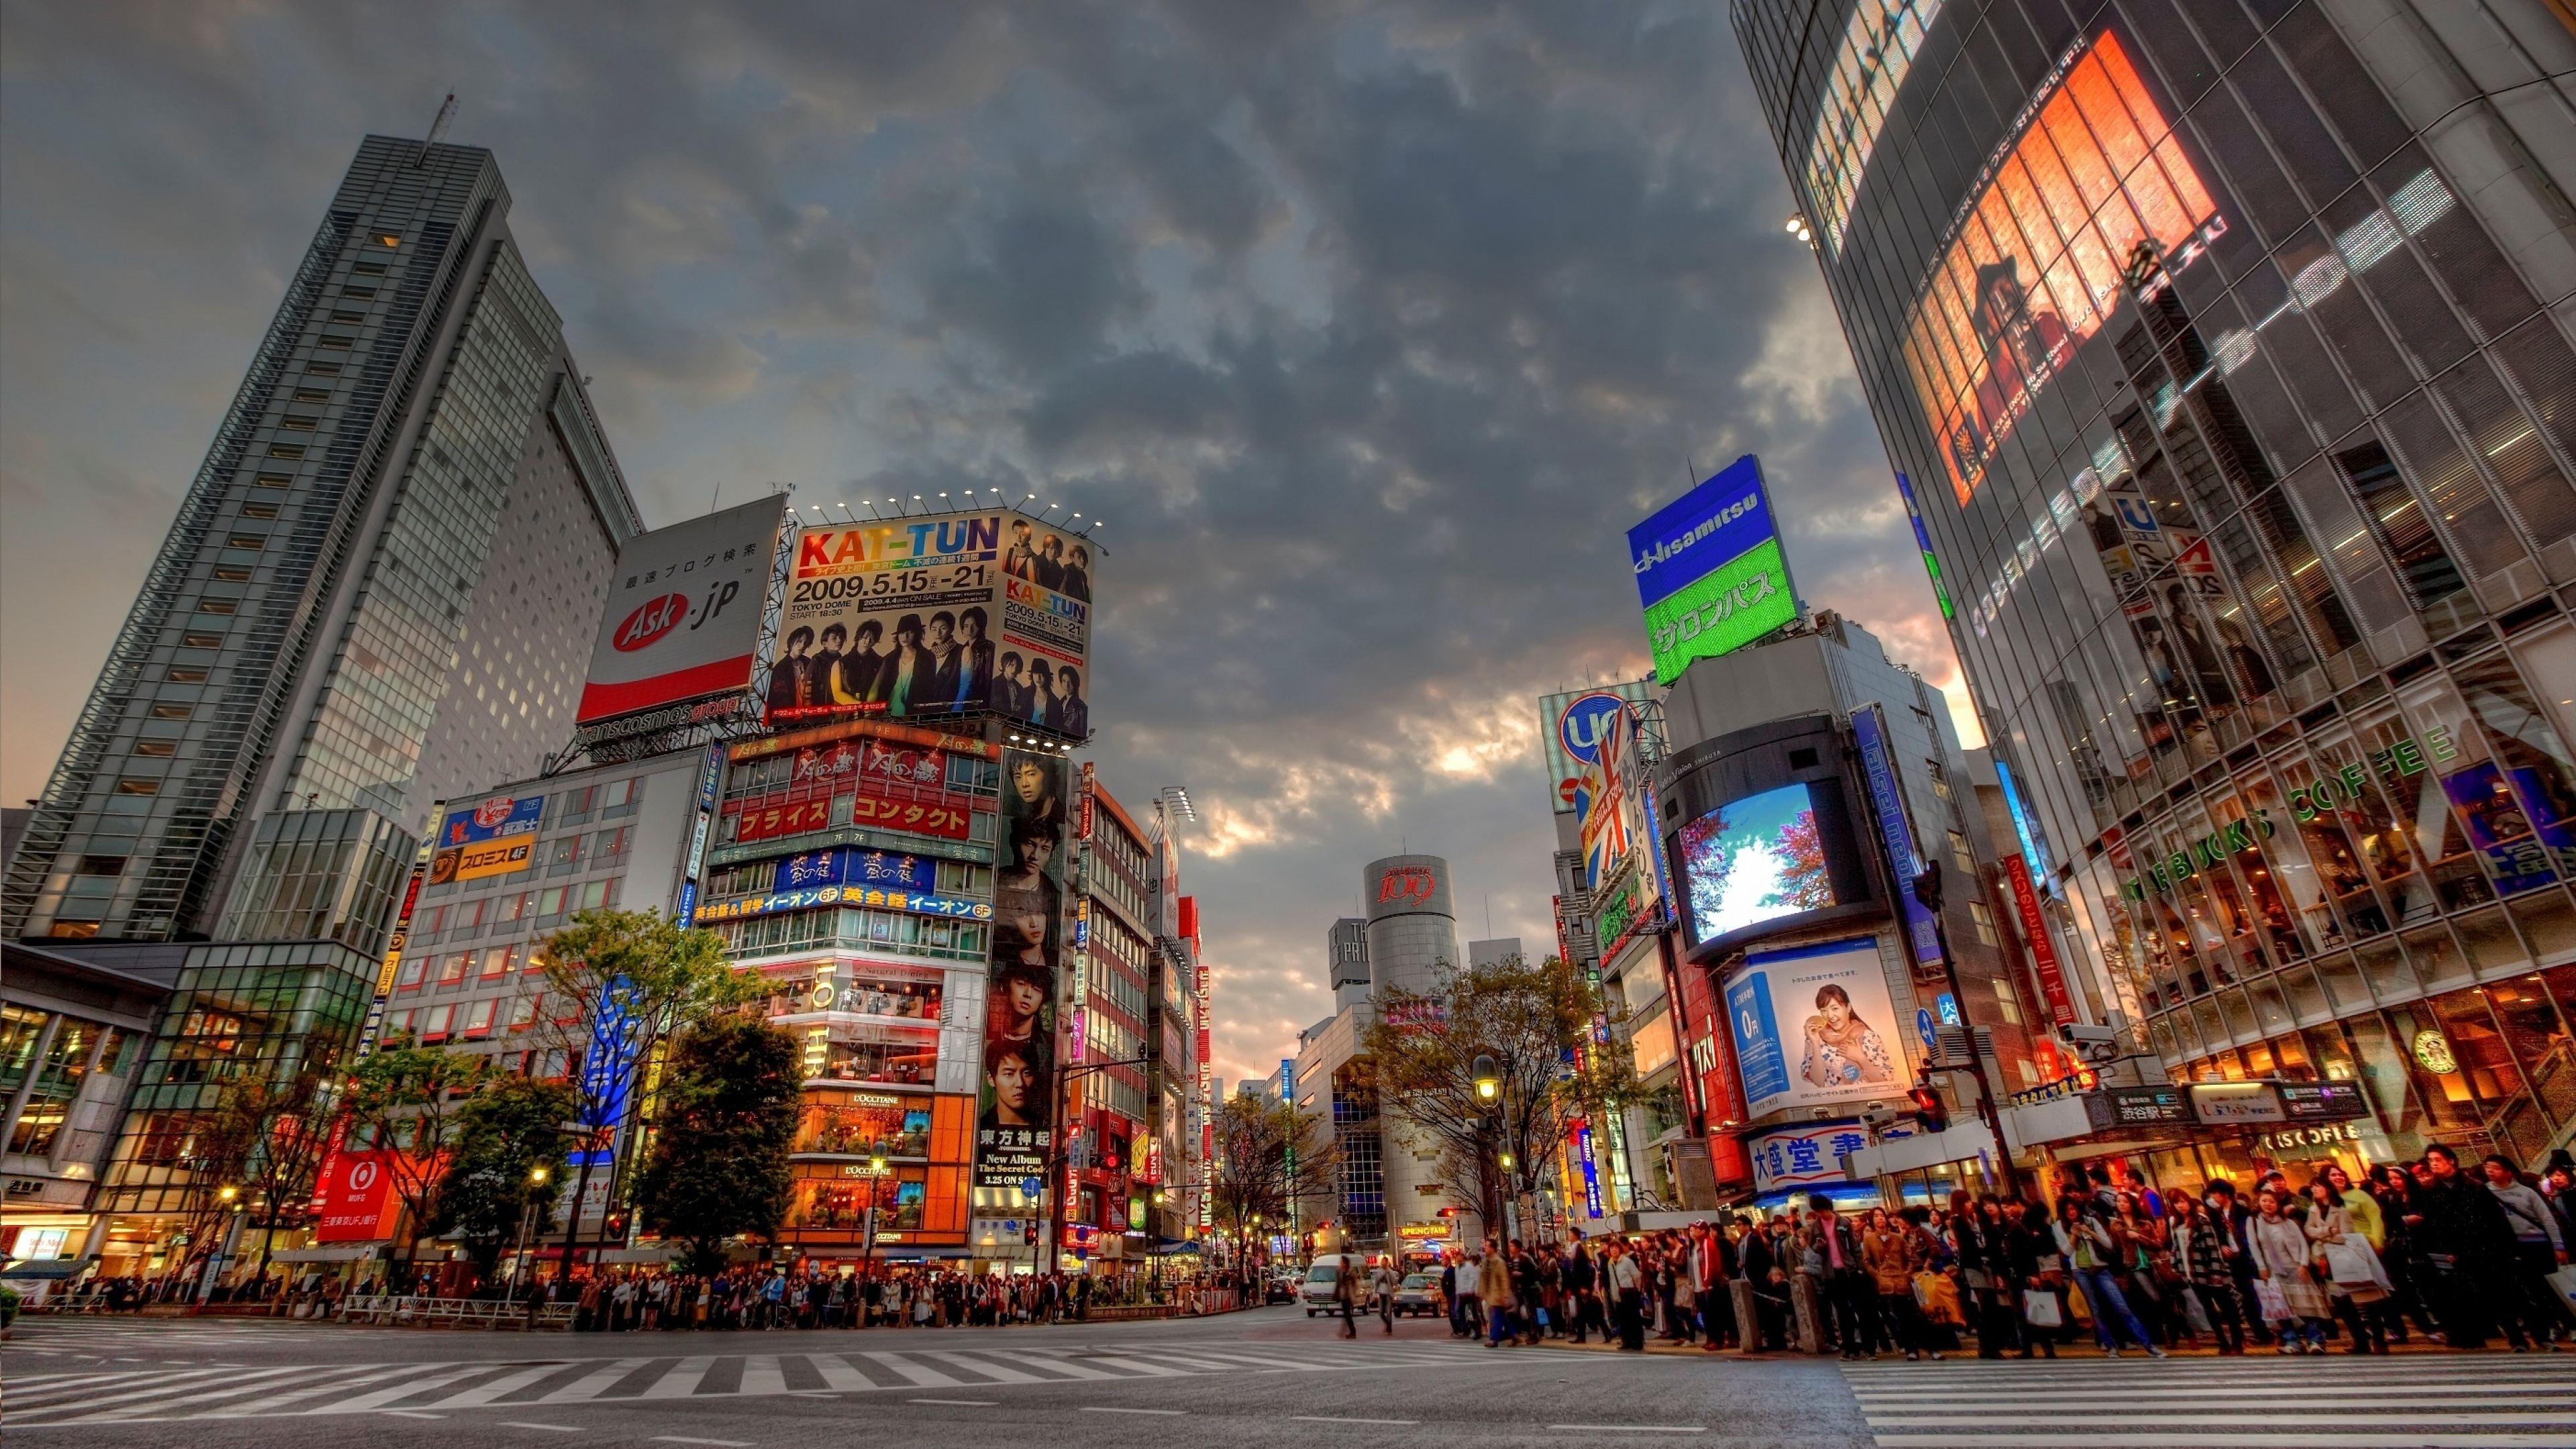 Harajuku Tokyo Wallpapers   Top Harajuku Tokyo Backgrounds 3840x2160